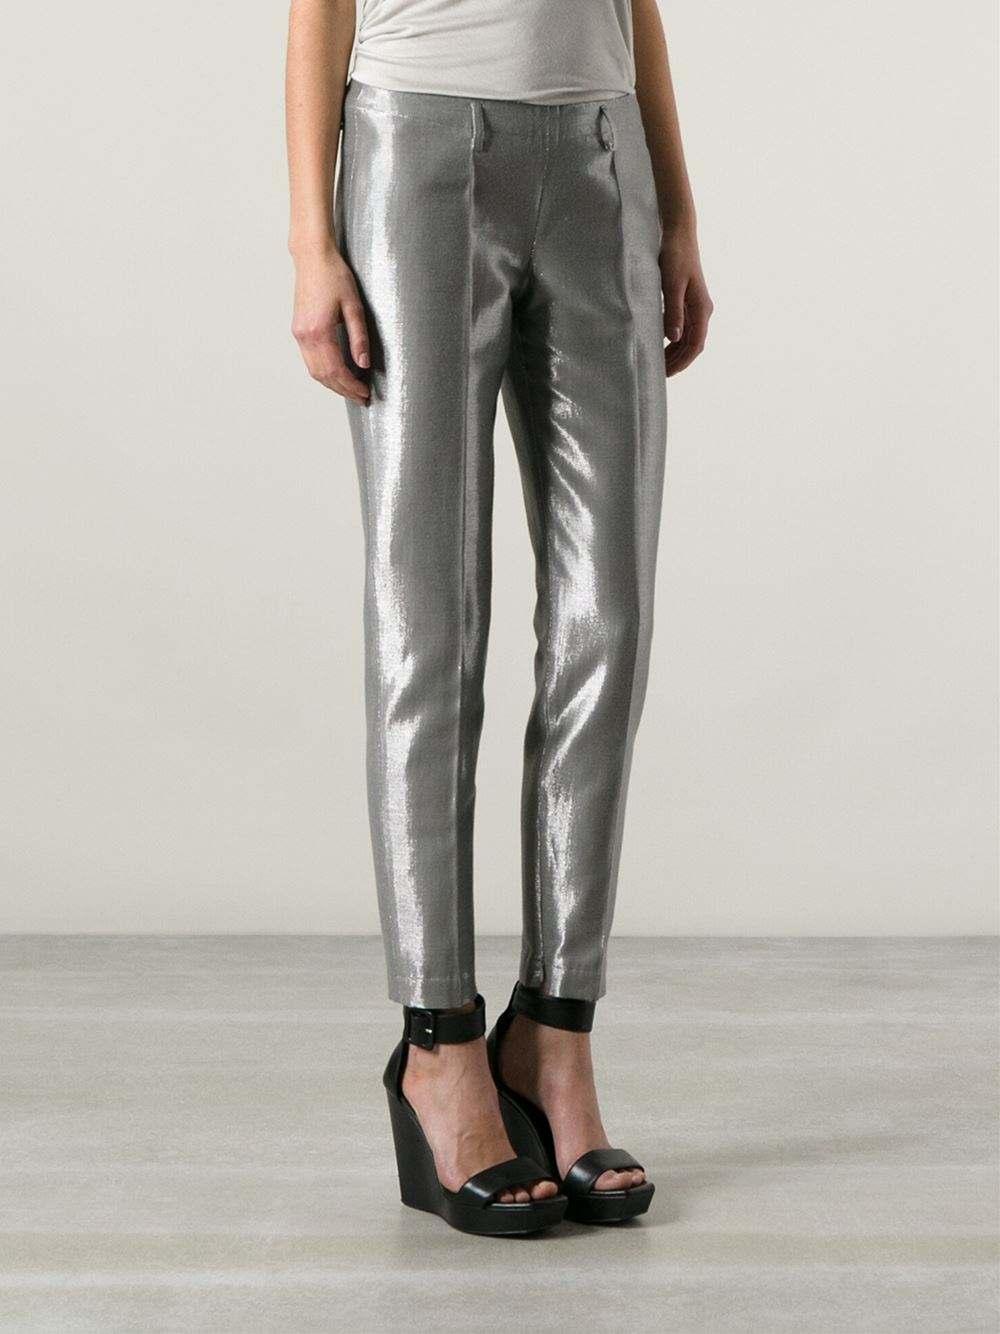 Peachoo+Krejberg - pantalon (254€ au lieu de 308€)